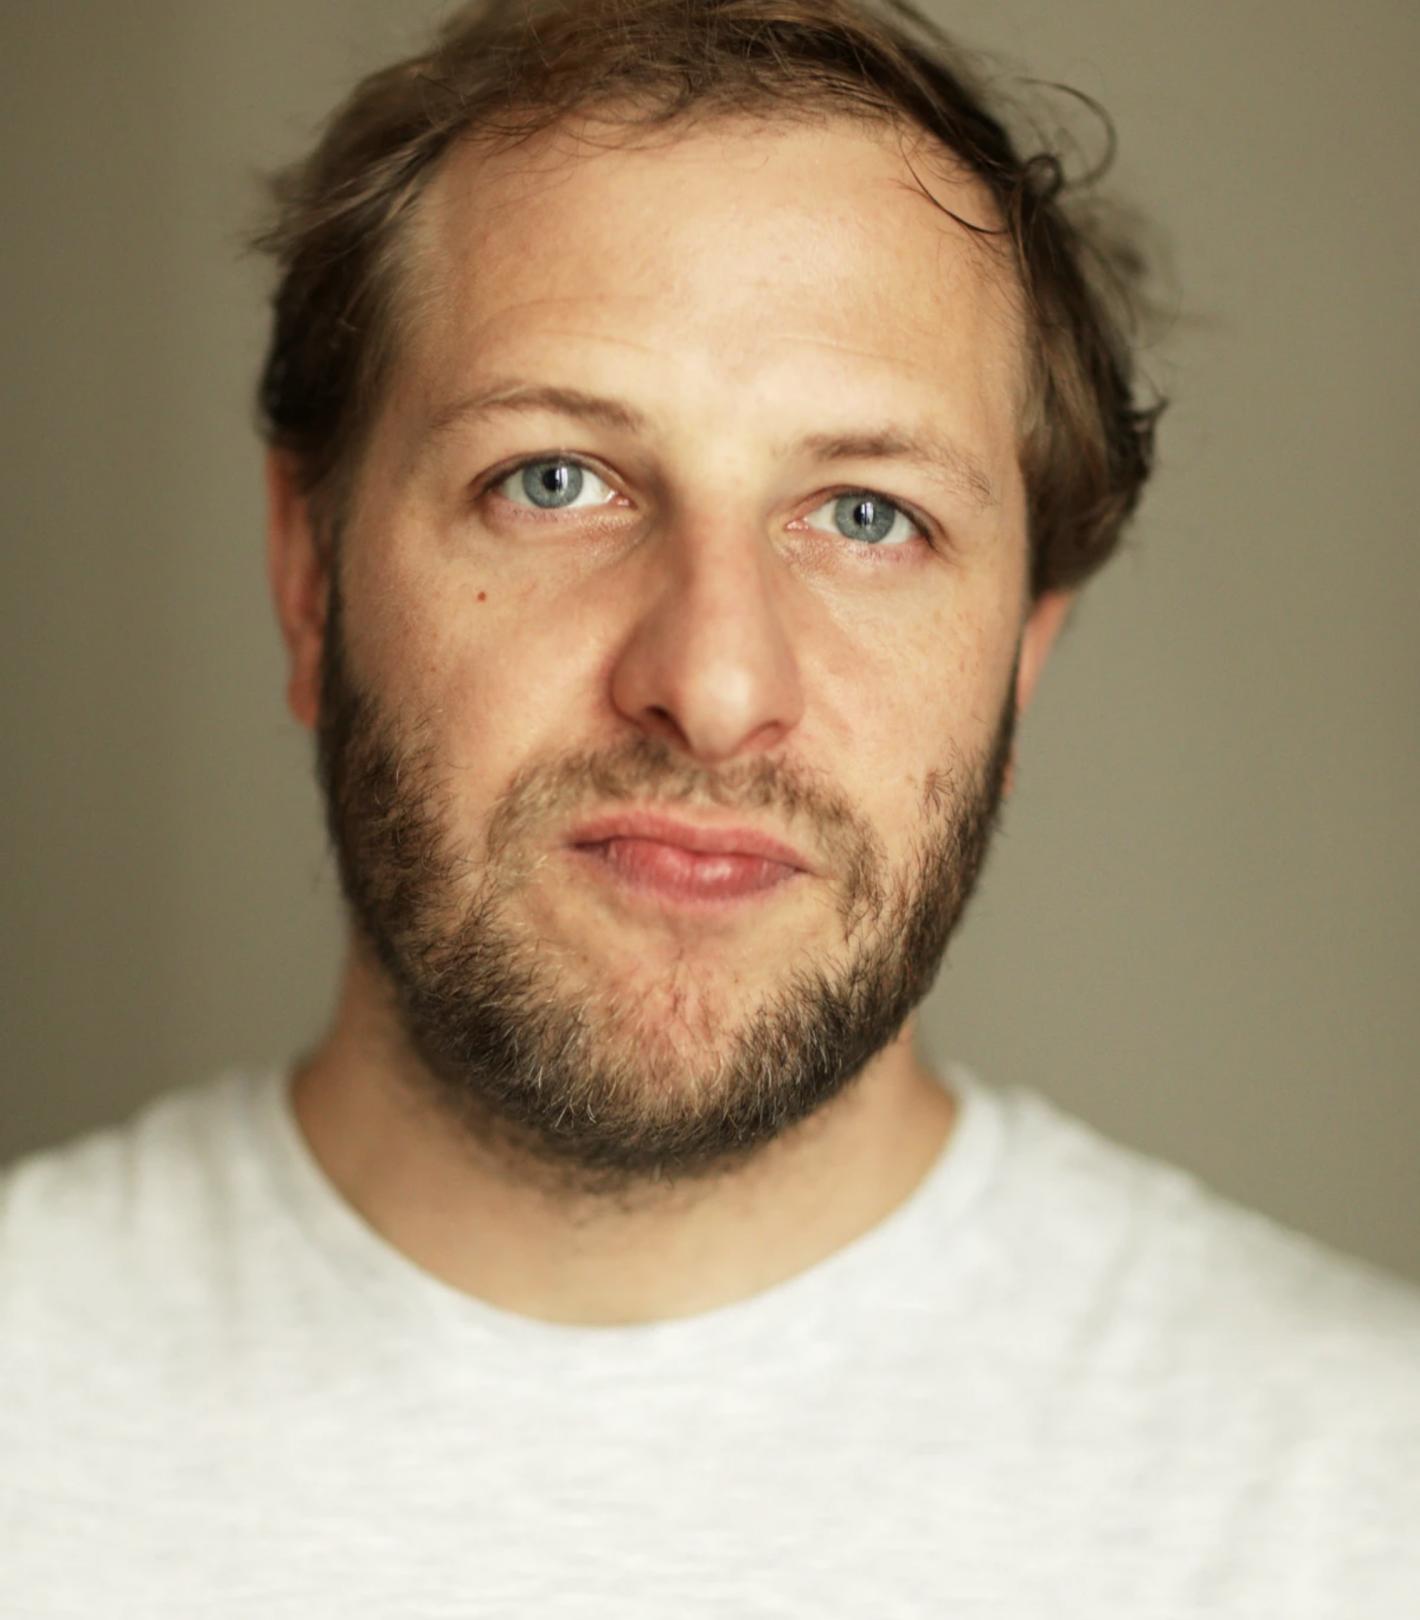 Jean-Charles Clichet